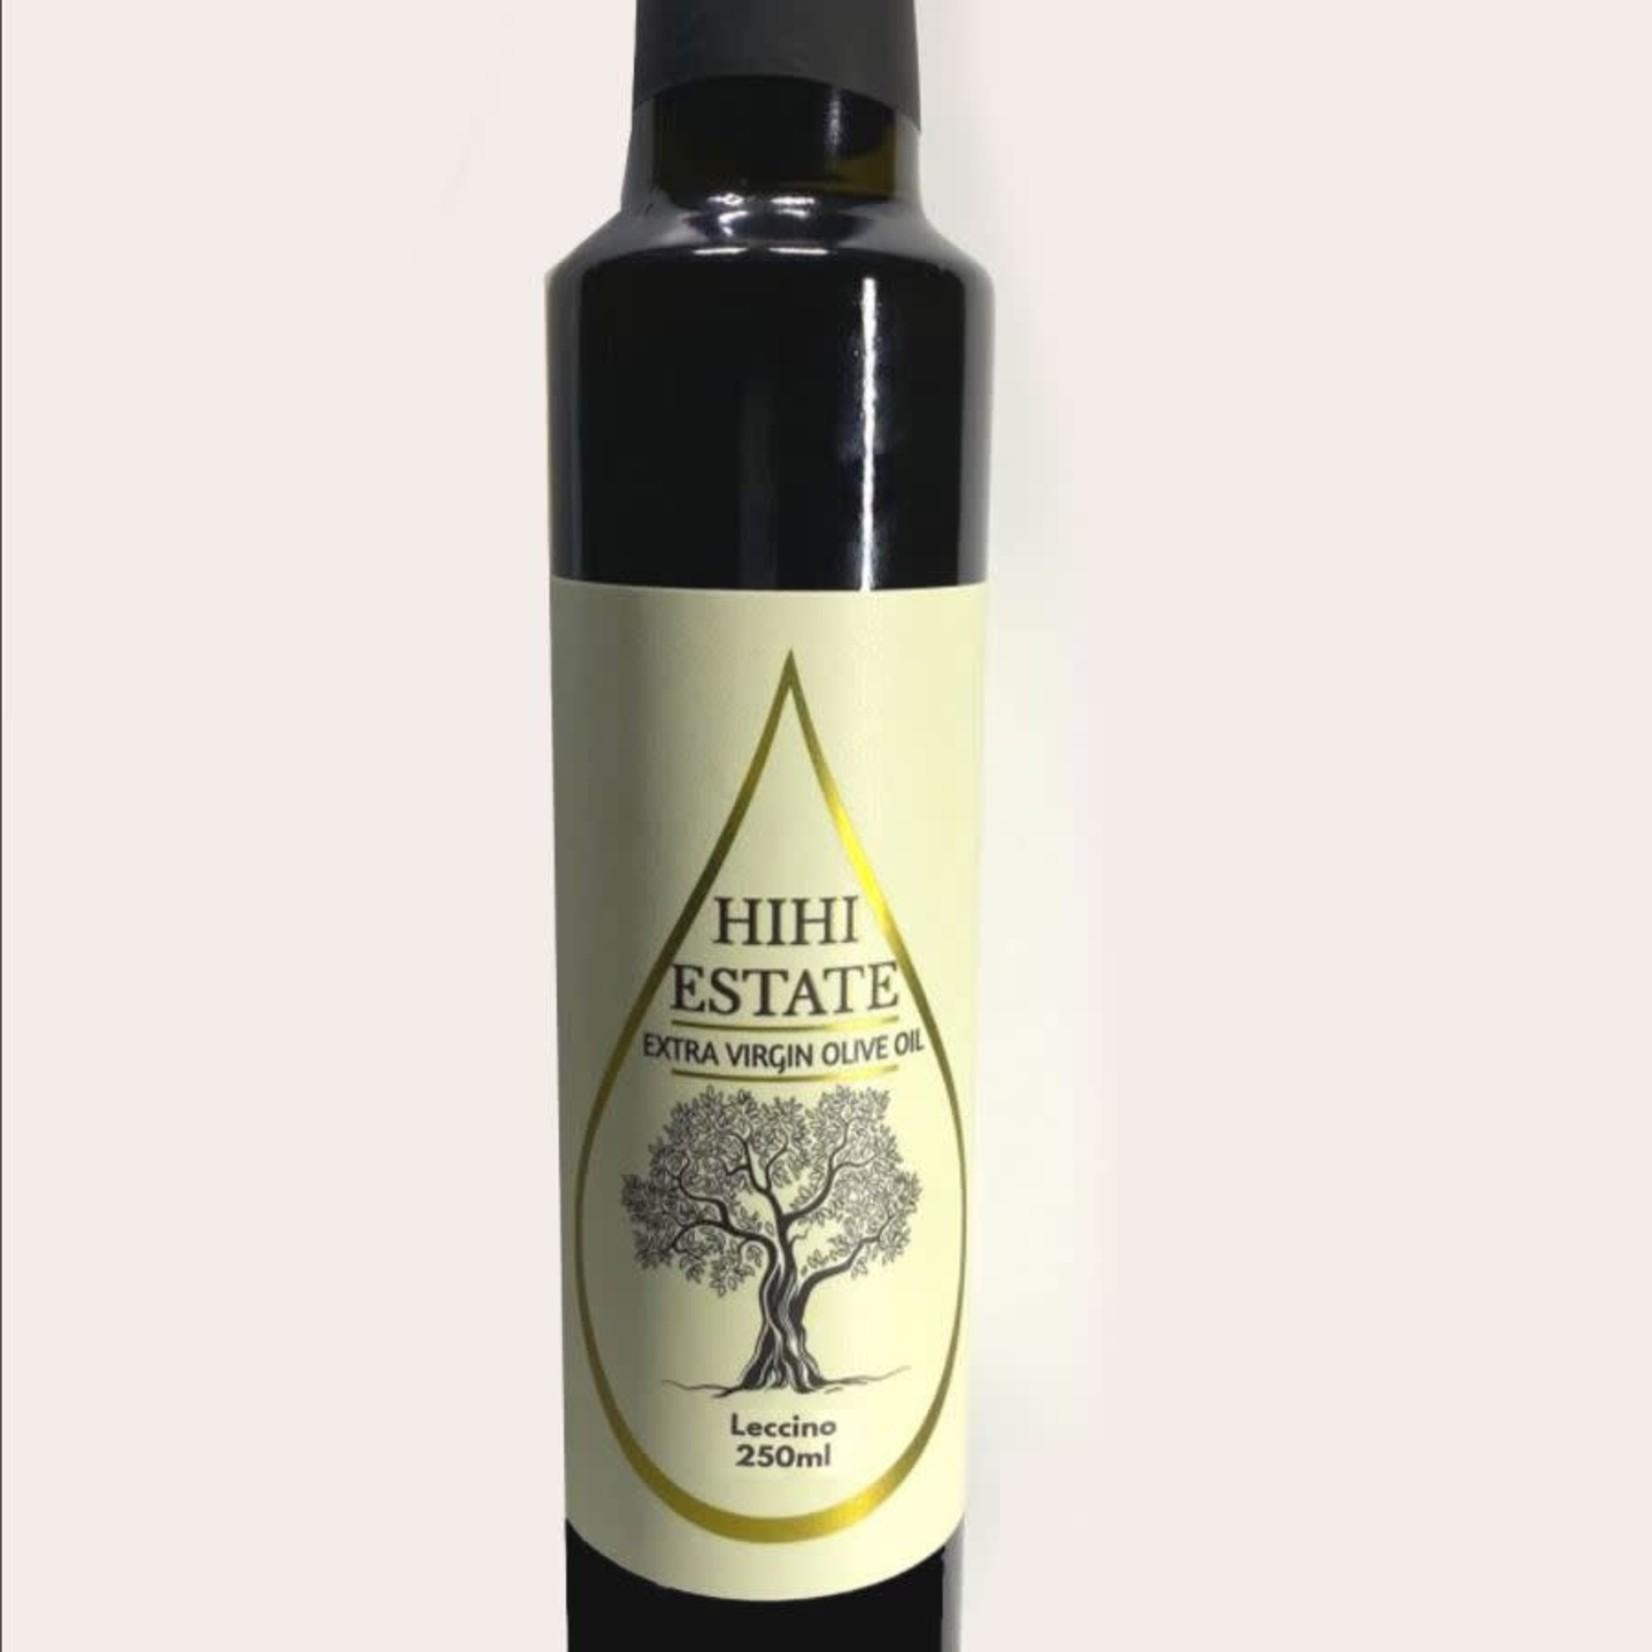 Hihi Estate Leccino Extra Virgin Olive Oil 250ml